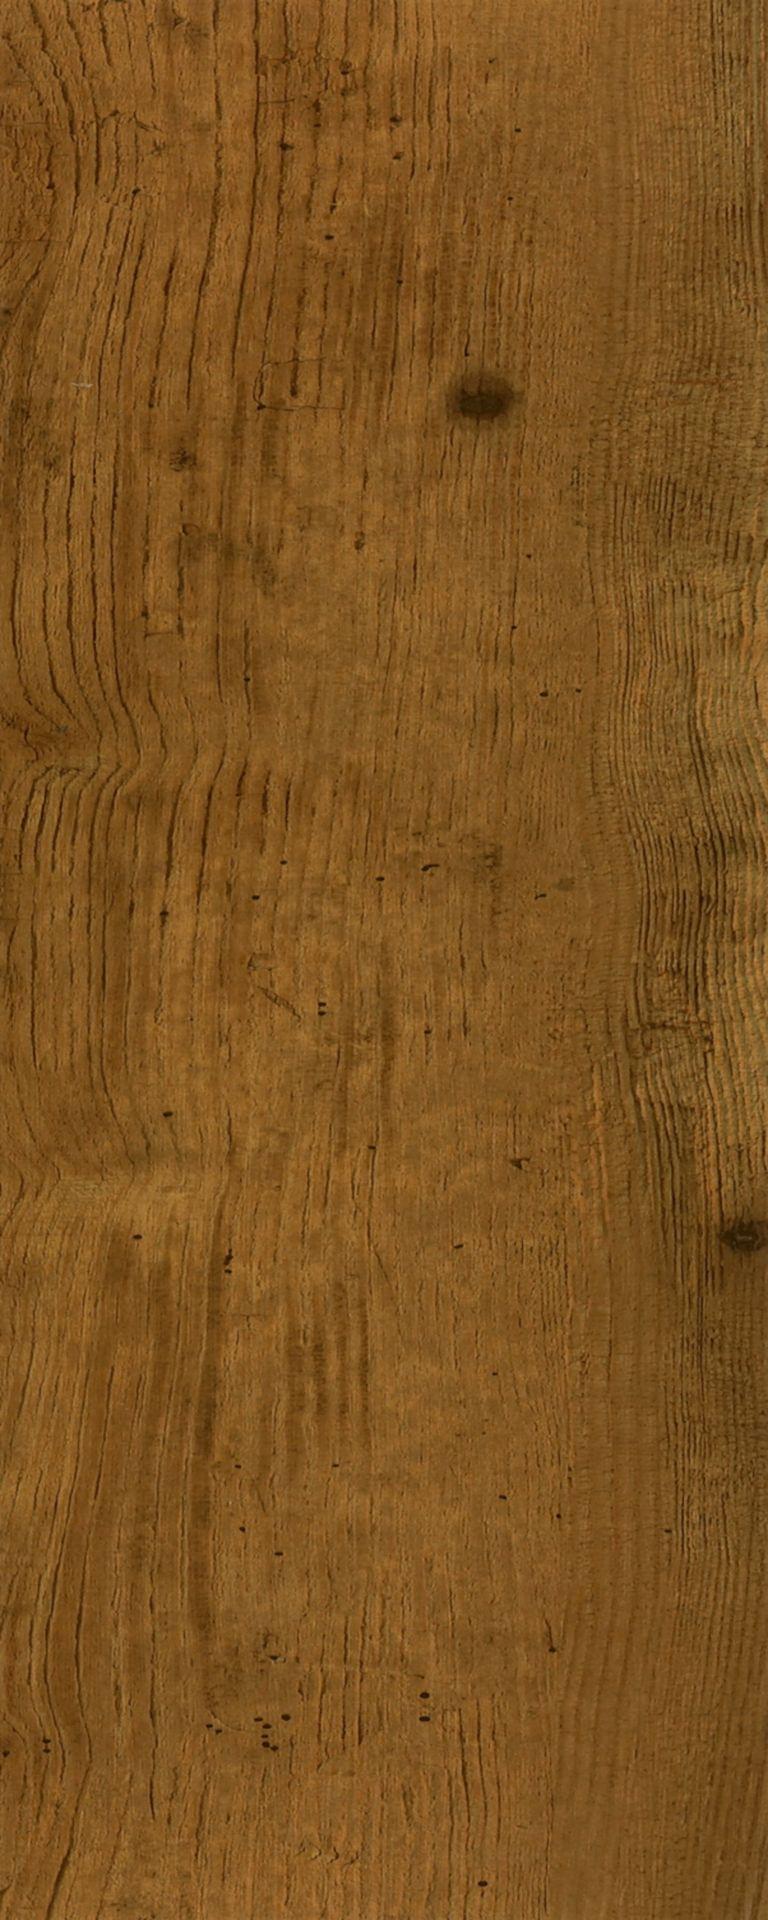 Ponderosa Pine - Natural Luxury Vinyl A6806